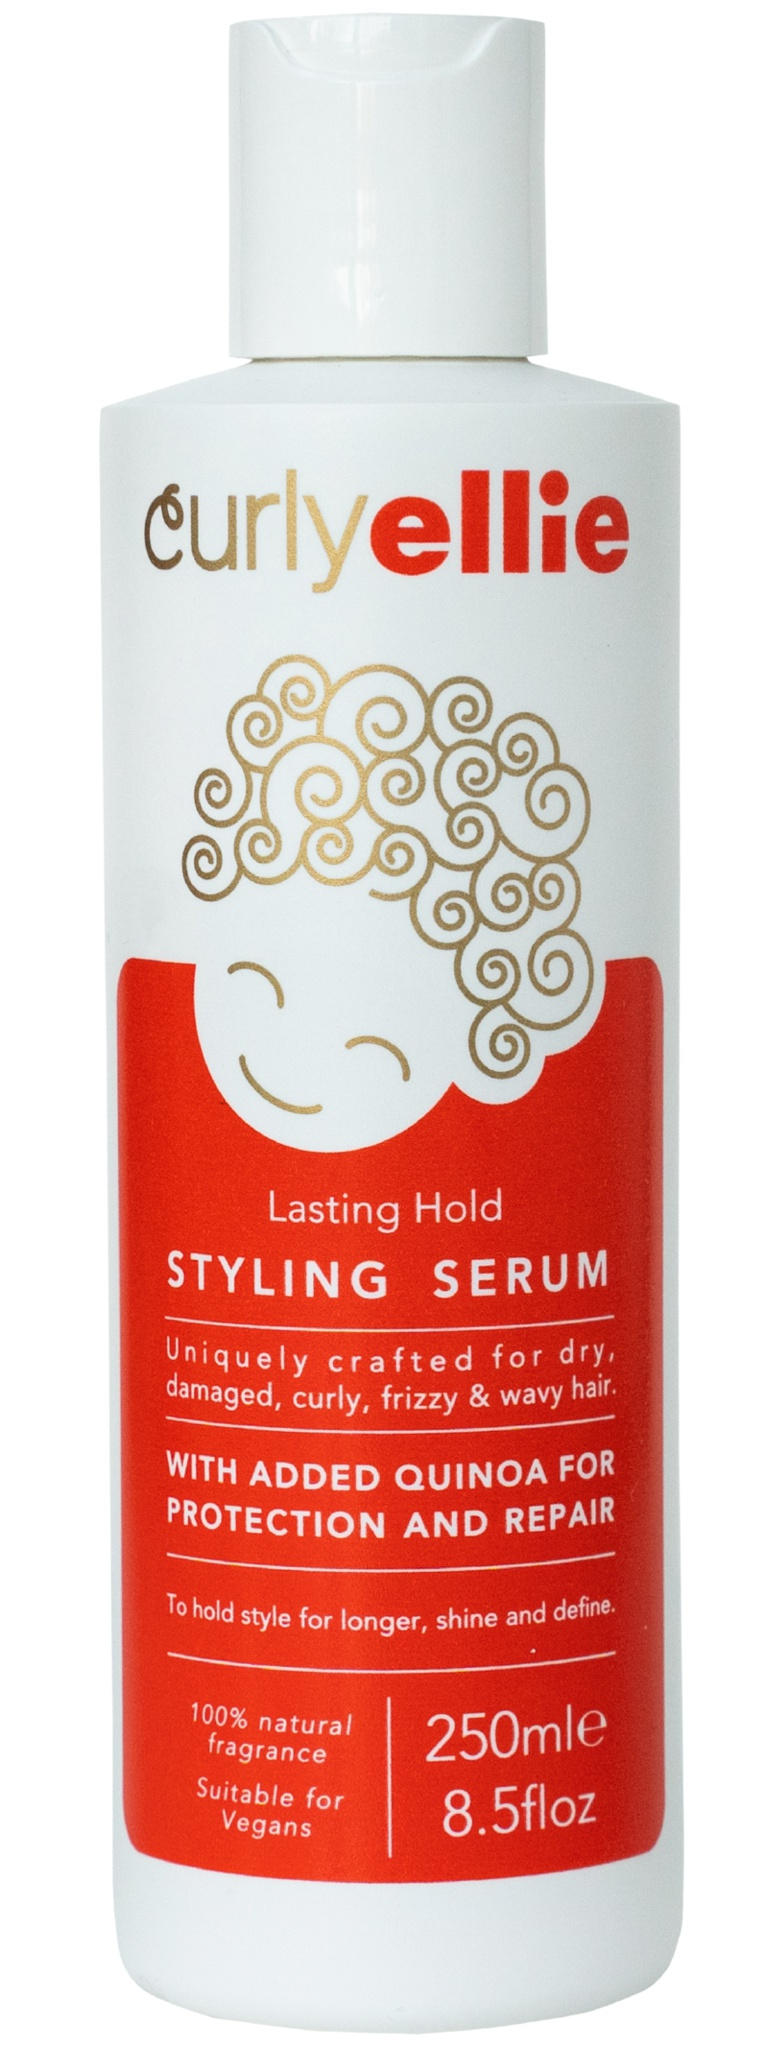 Curly Ellie Styling Serum